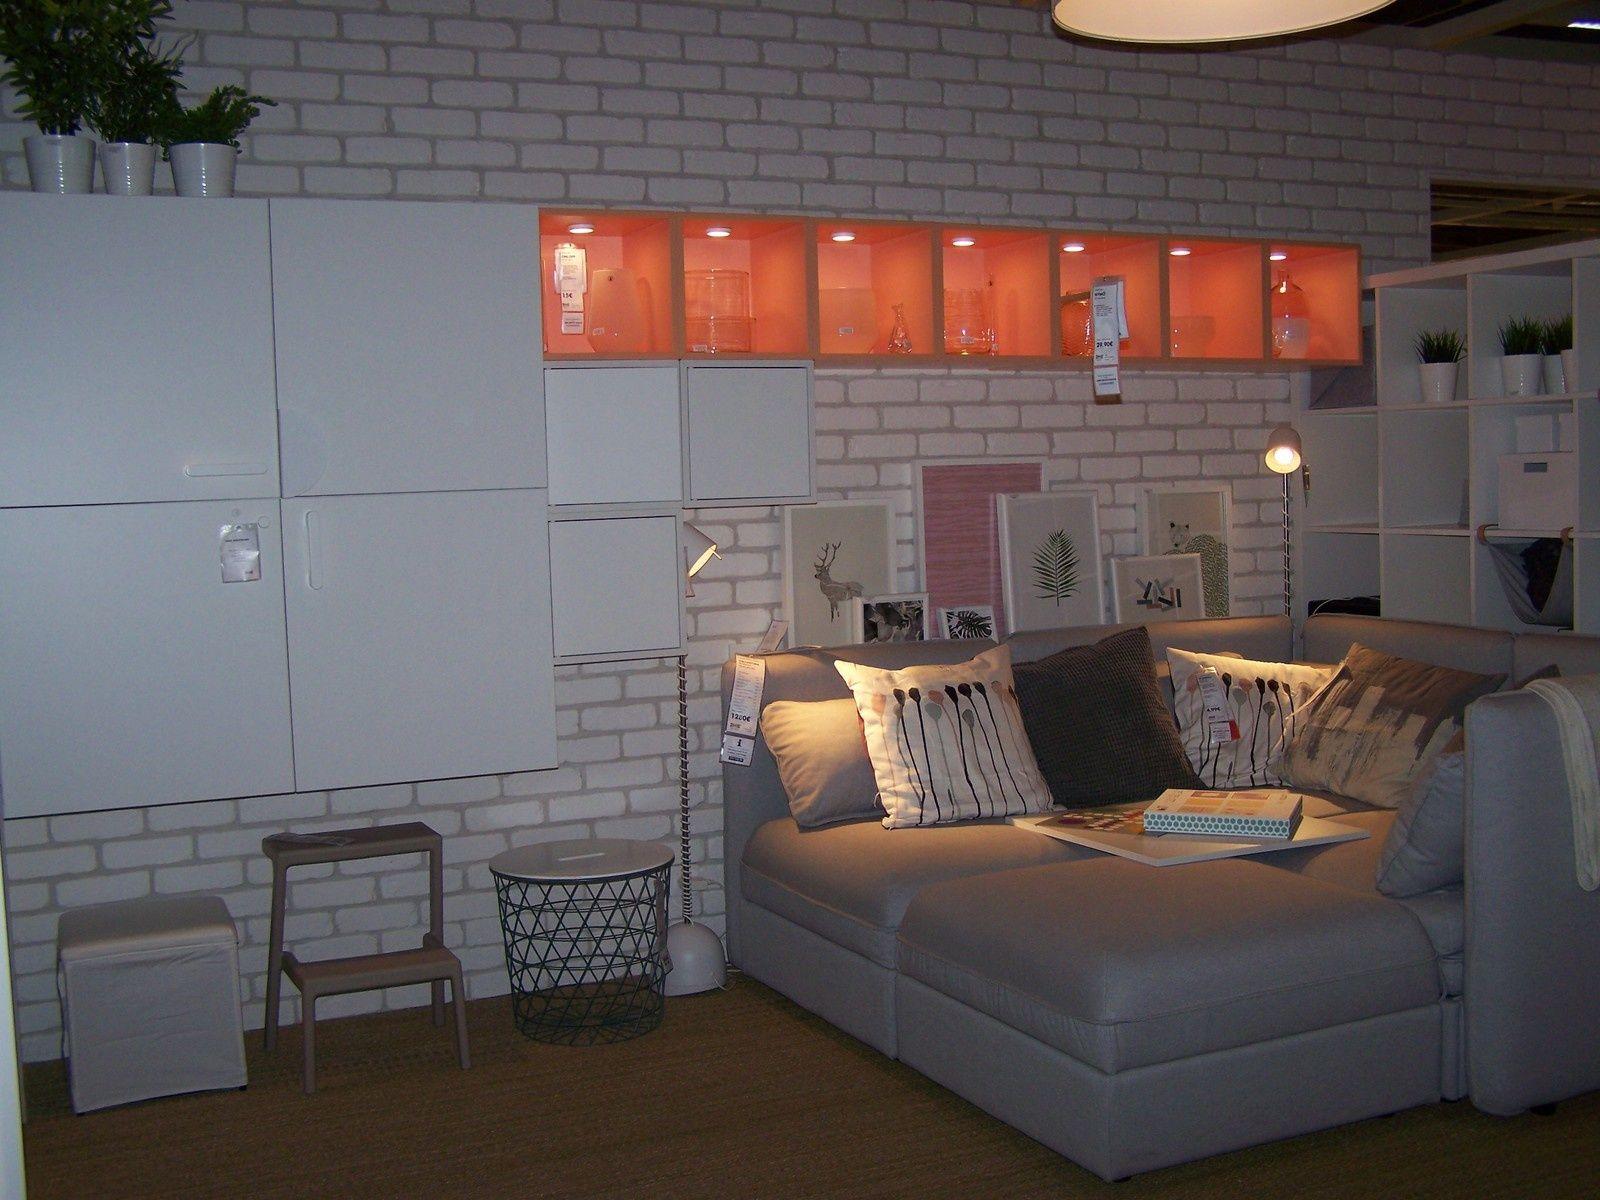 Album 23 Eket La Nouvelle Gamme De Chez Ikea Ikea  # Ikea Etegere Cube Modulo Bois